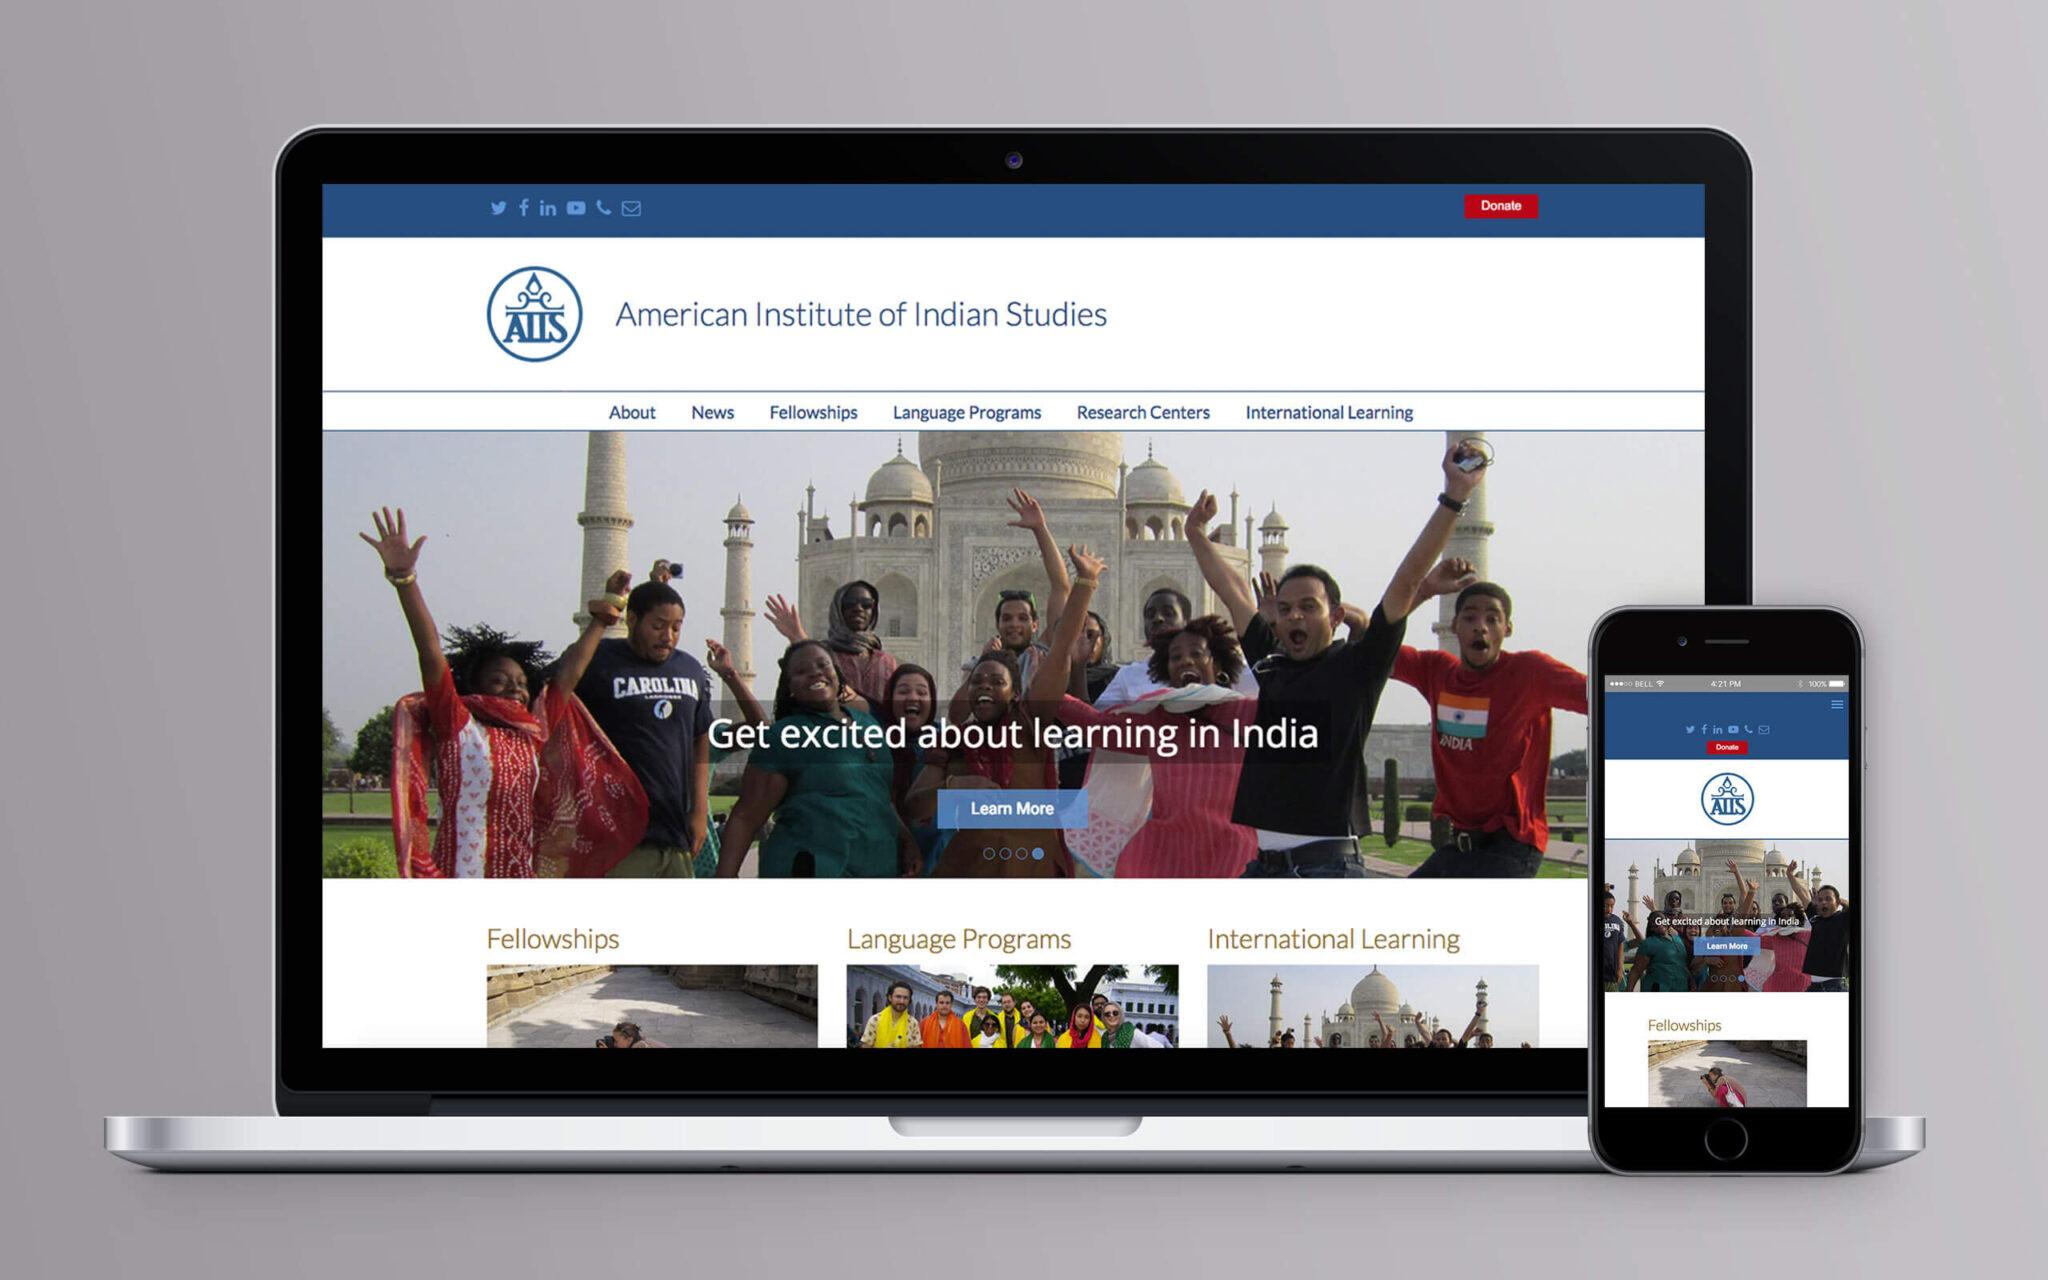 American Institute of Indian Studies American Institute of Indian Studies Website Home